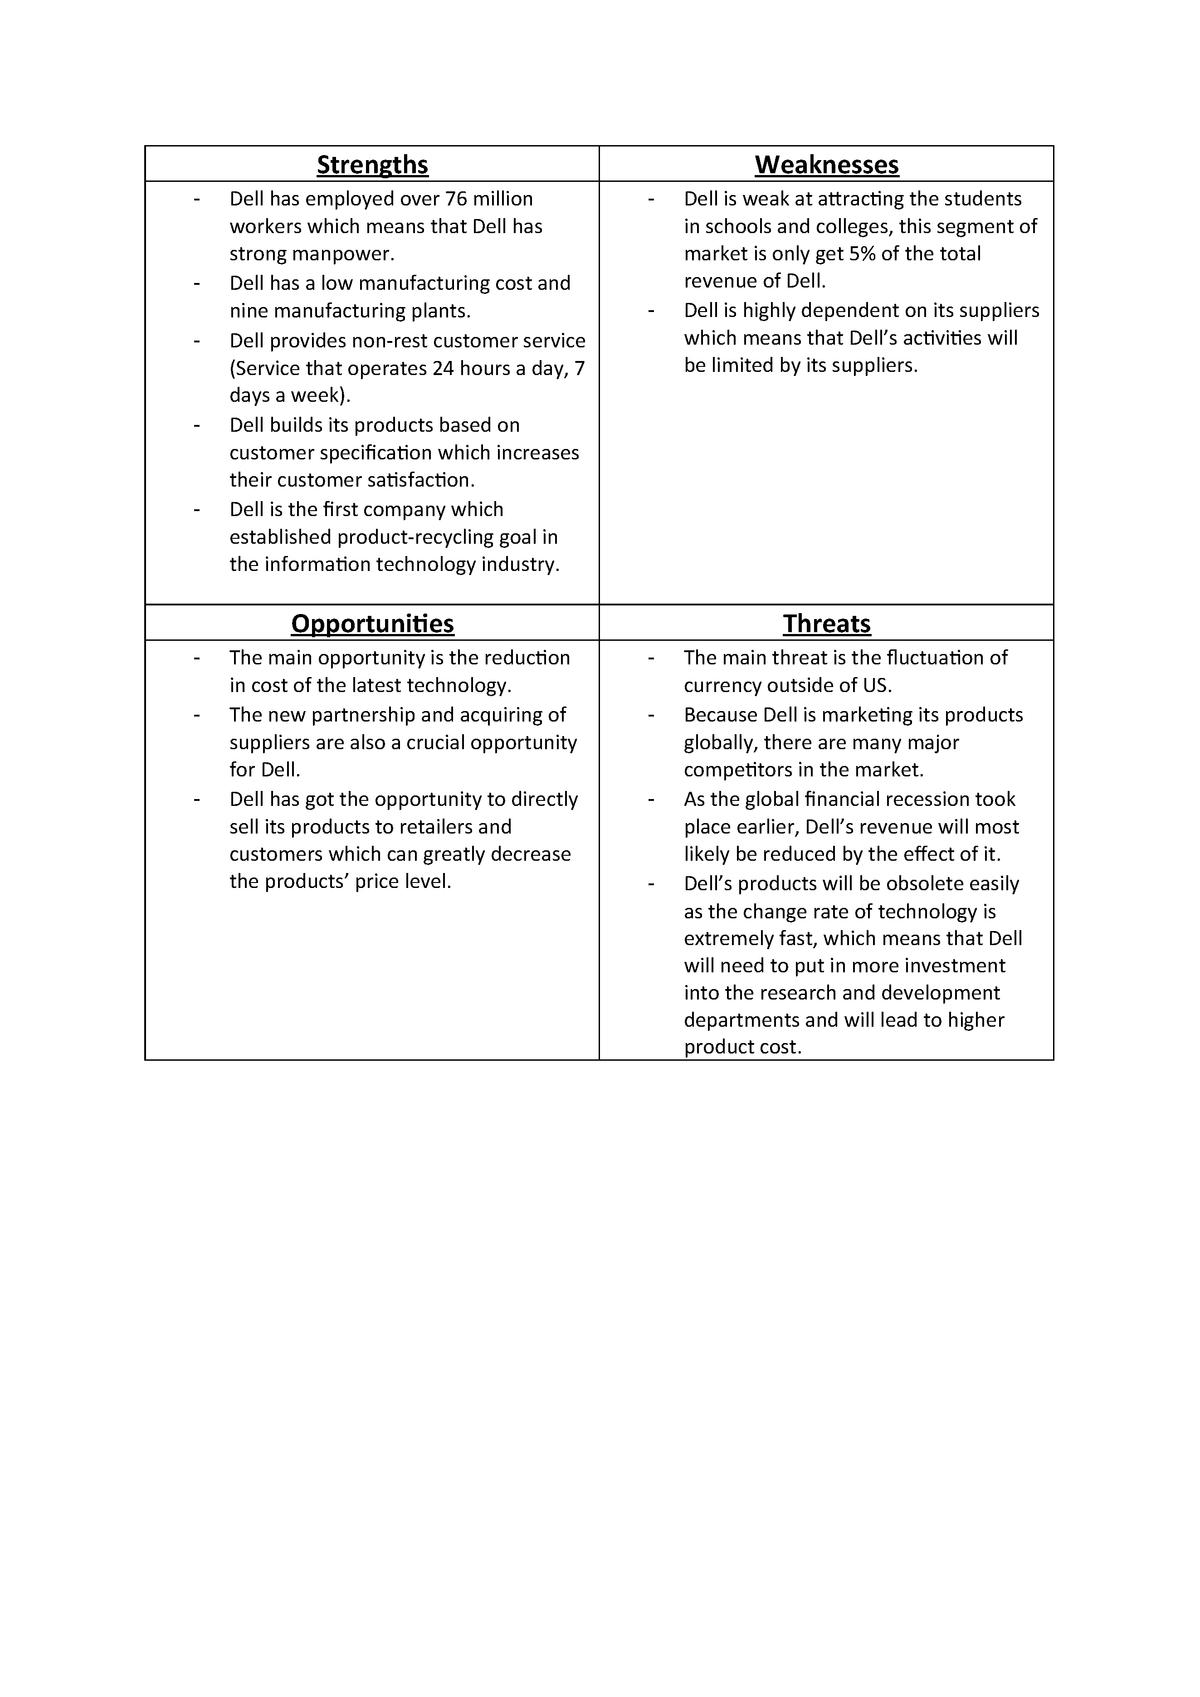 Buy custom custom essay on shakespeare